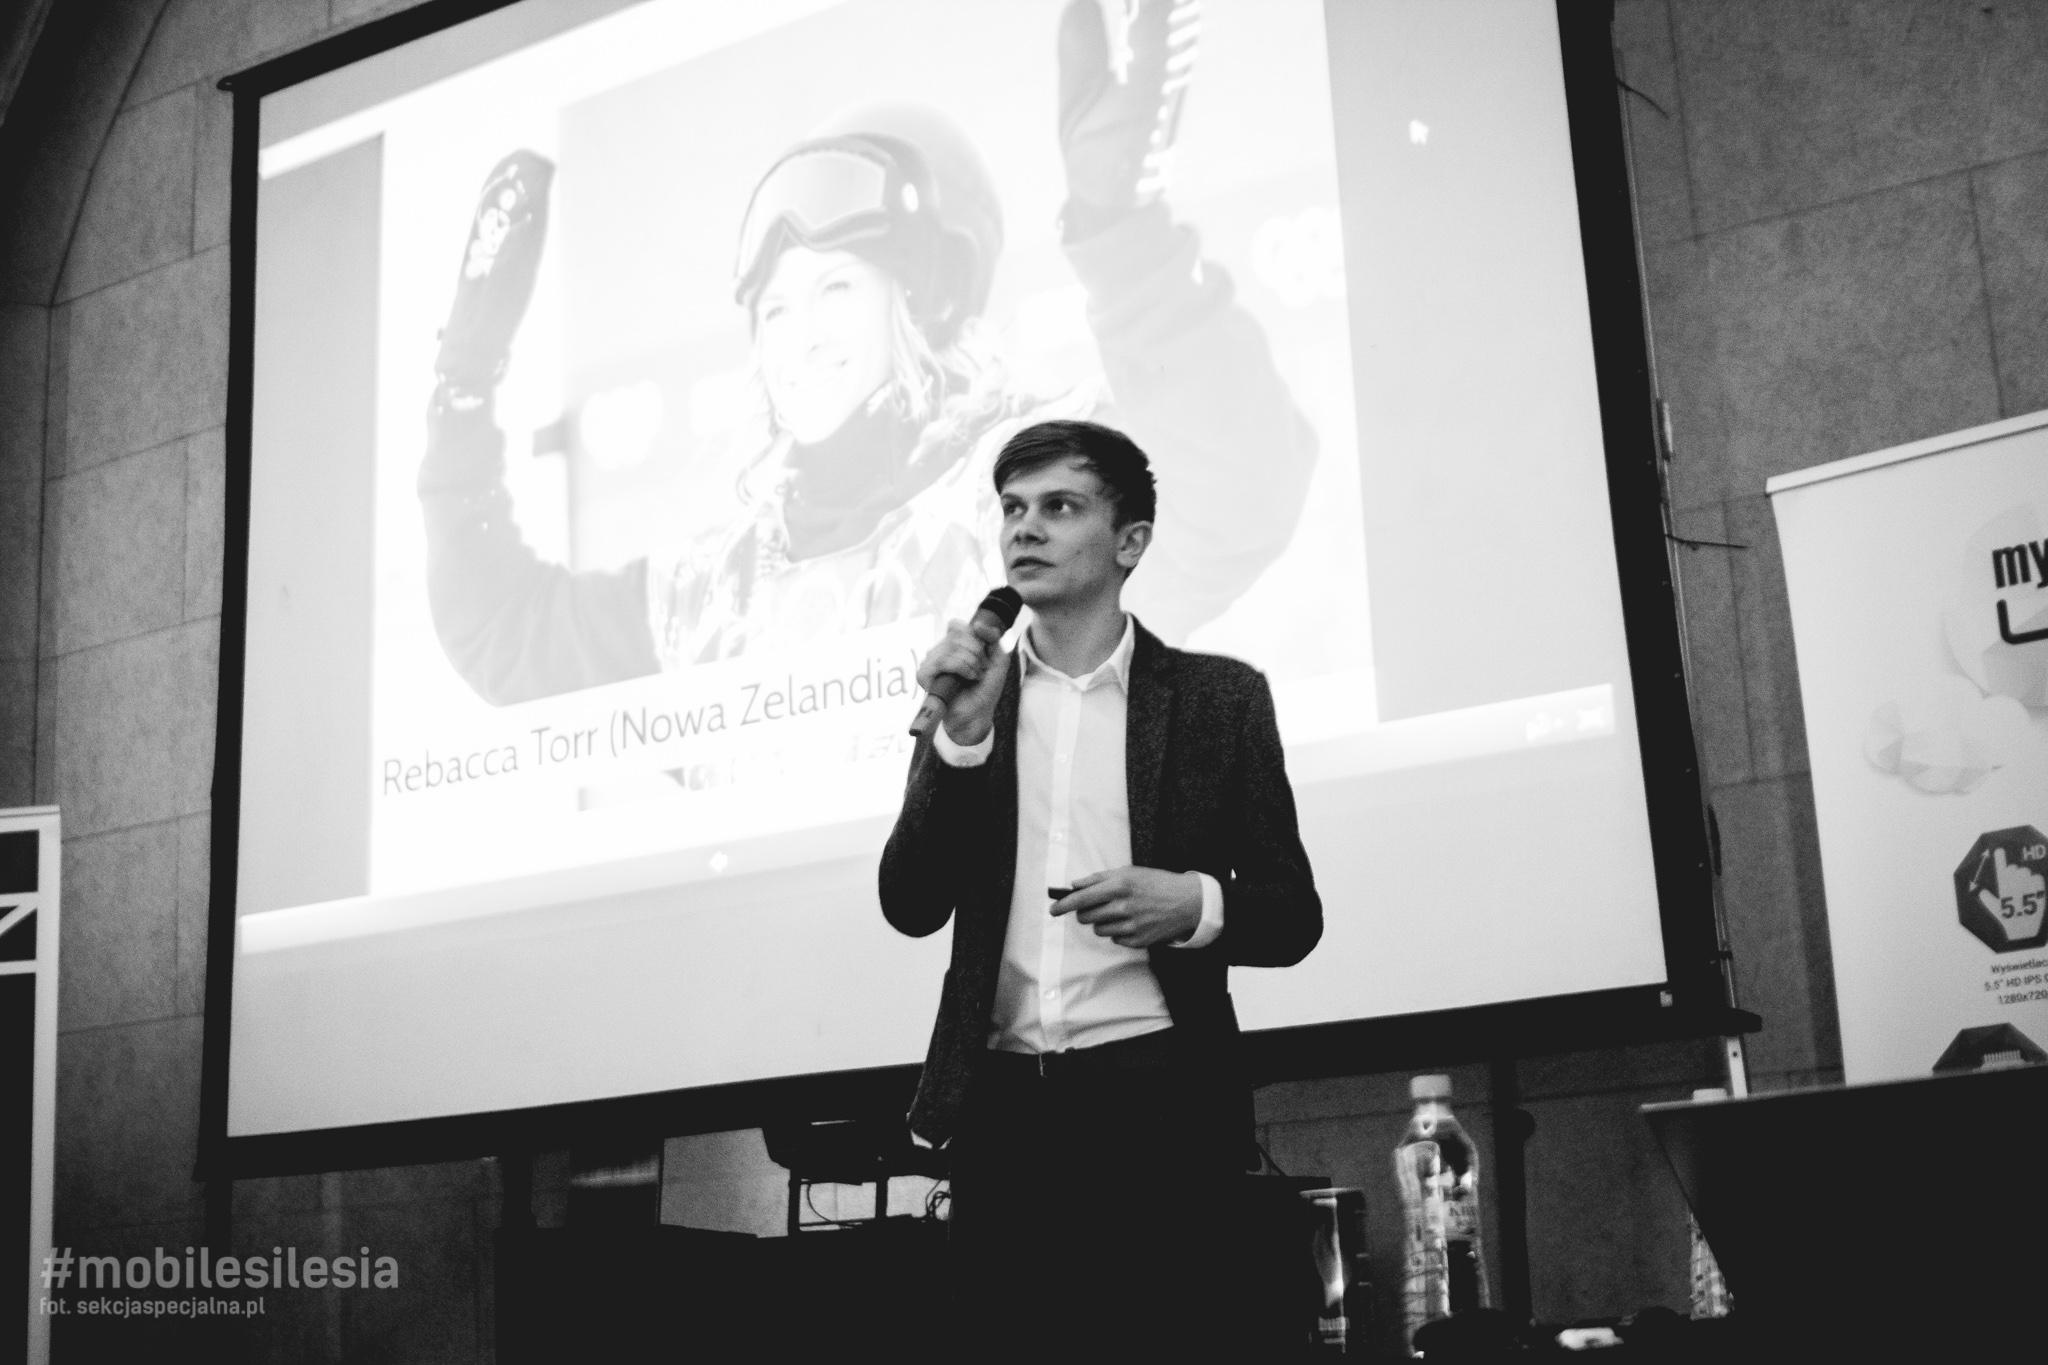 Jakub Biel podczas prelekcji na Mobile Silesia